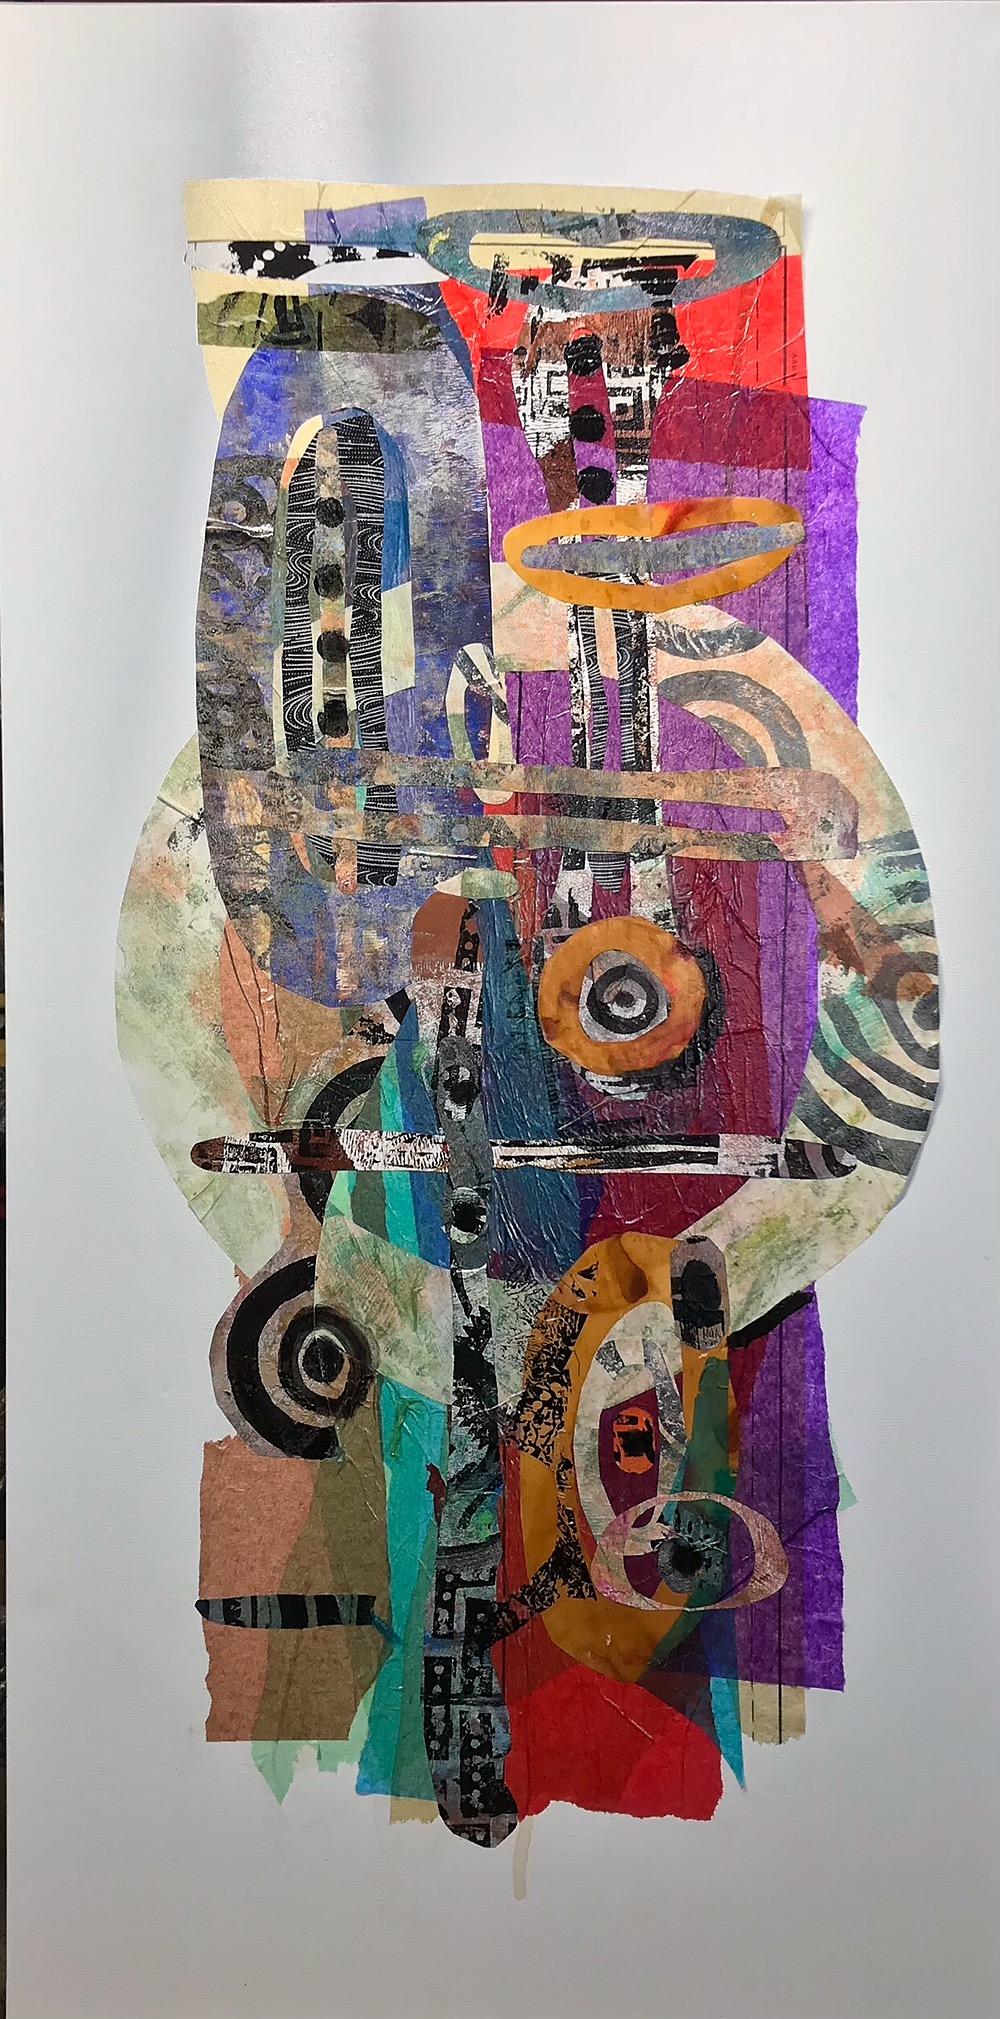 Rhythm section by Raphael Maximo Sanchez   ArtworkNetwork.com